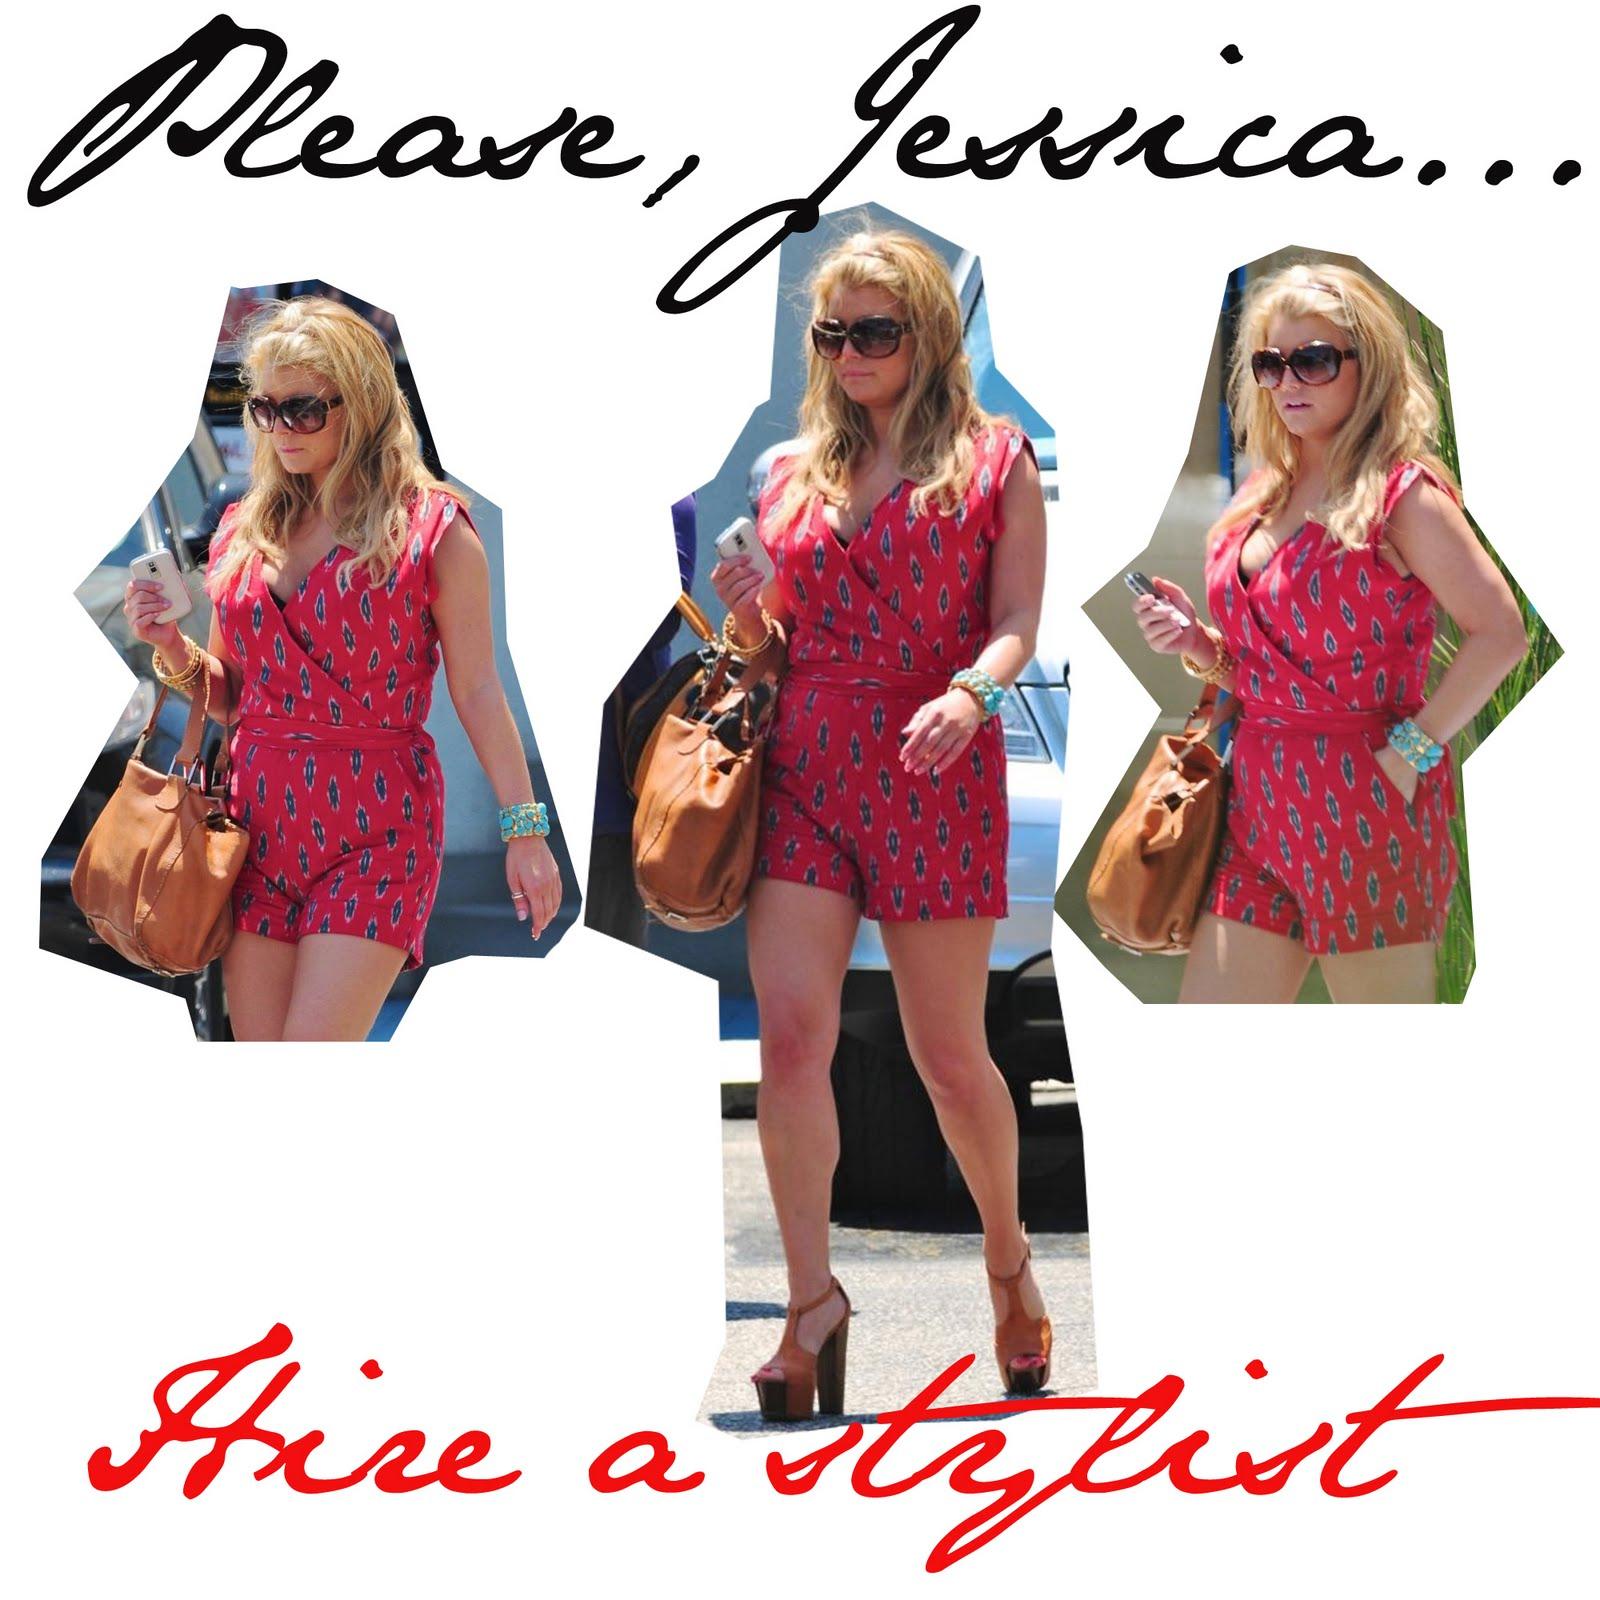 http://3.bp.blogspot.com/_NuQ1asHchXU/TEV38g_9gCI/AAAAAAAAIr4/CSaNNHlVi1c/s1600/Jessica+simpson+romper.JPG